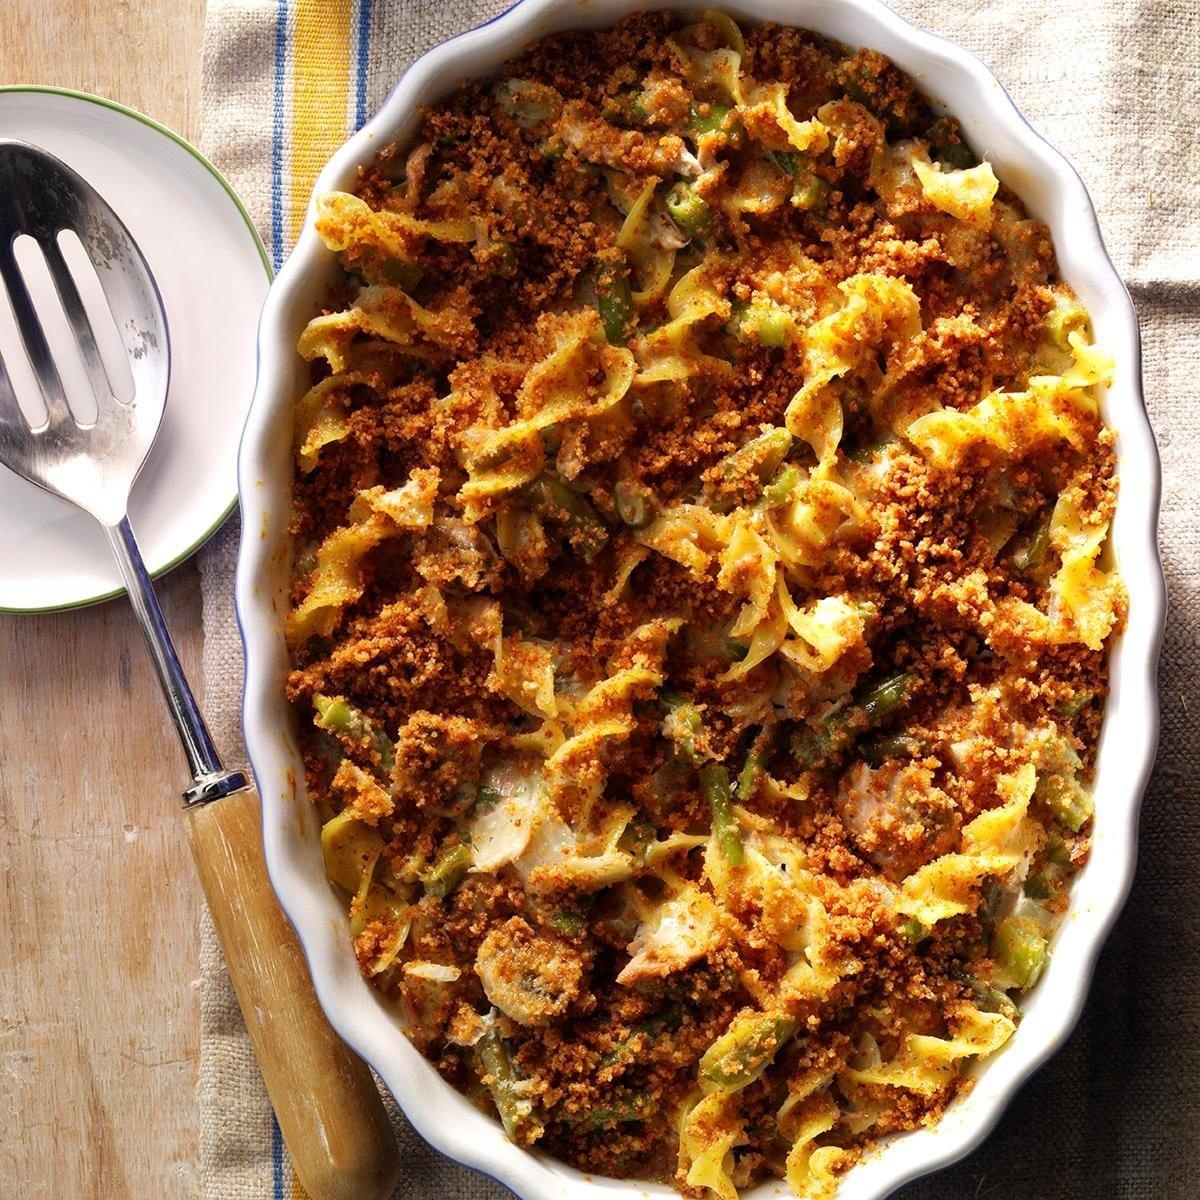 Tuna Mushroom Casserole Recipe | Taste of Home